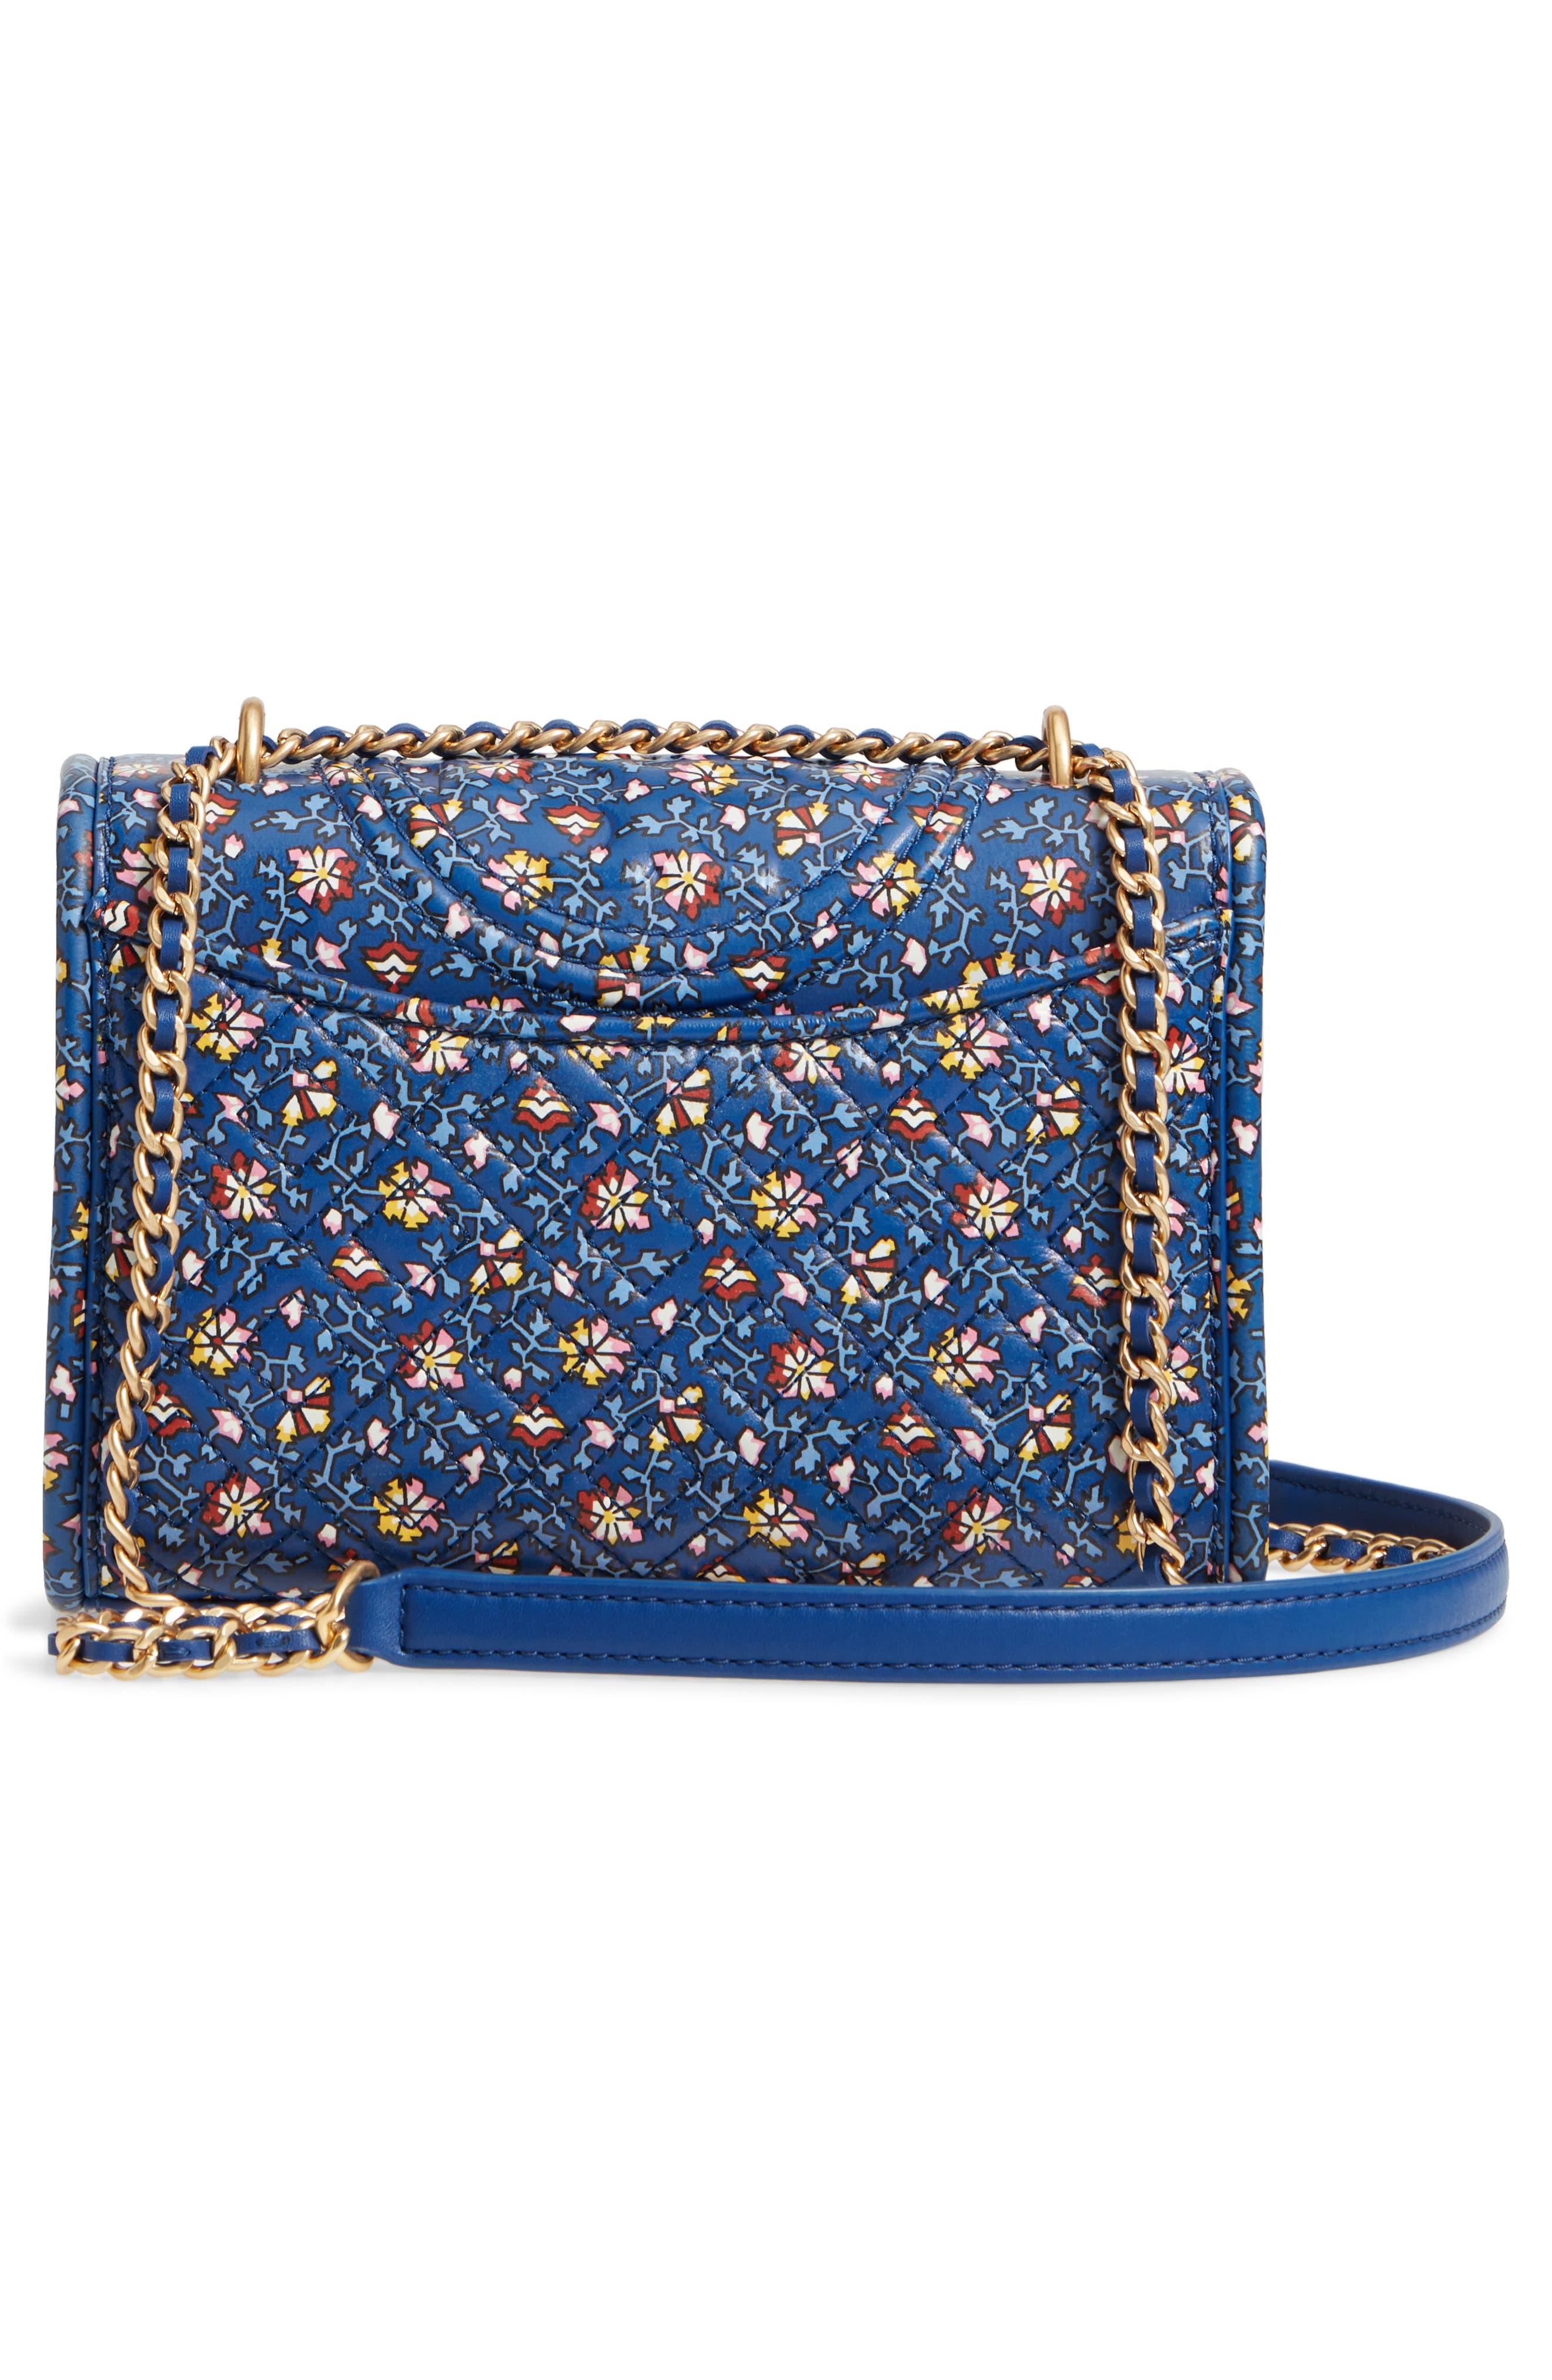 Fleming Print Leather Convertible Shoulder Bag,                             Alternate thumbnail 3, color,                             BLUE WILD PANSY